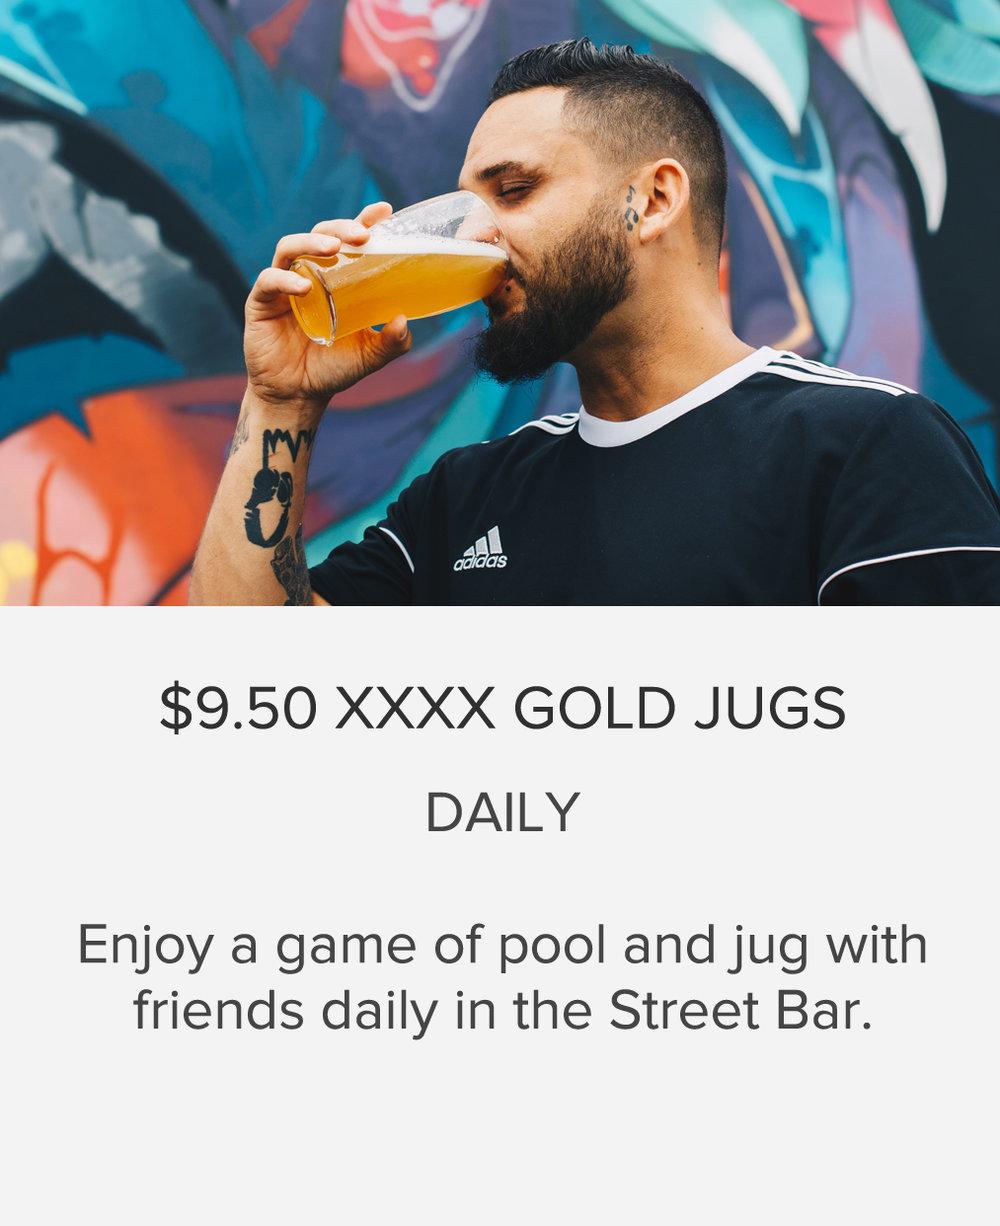 SB---Gold-Jugs.jpg